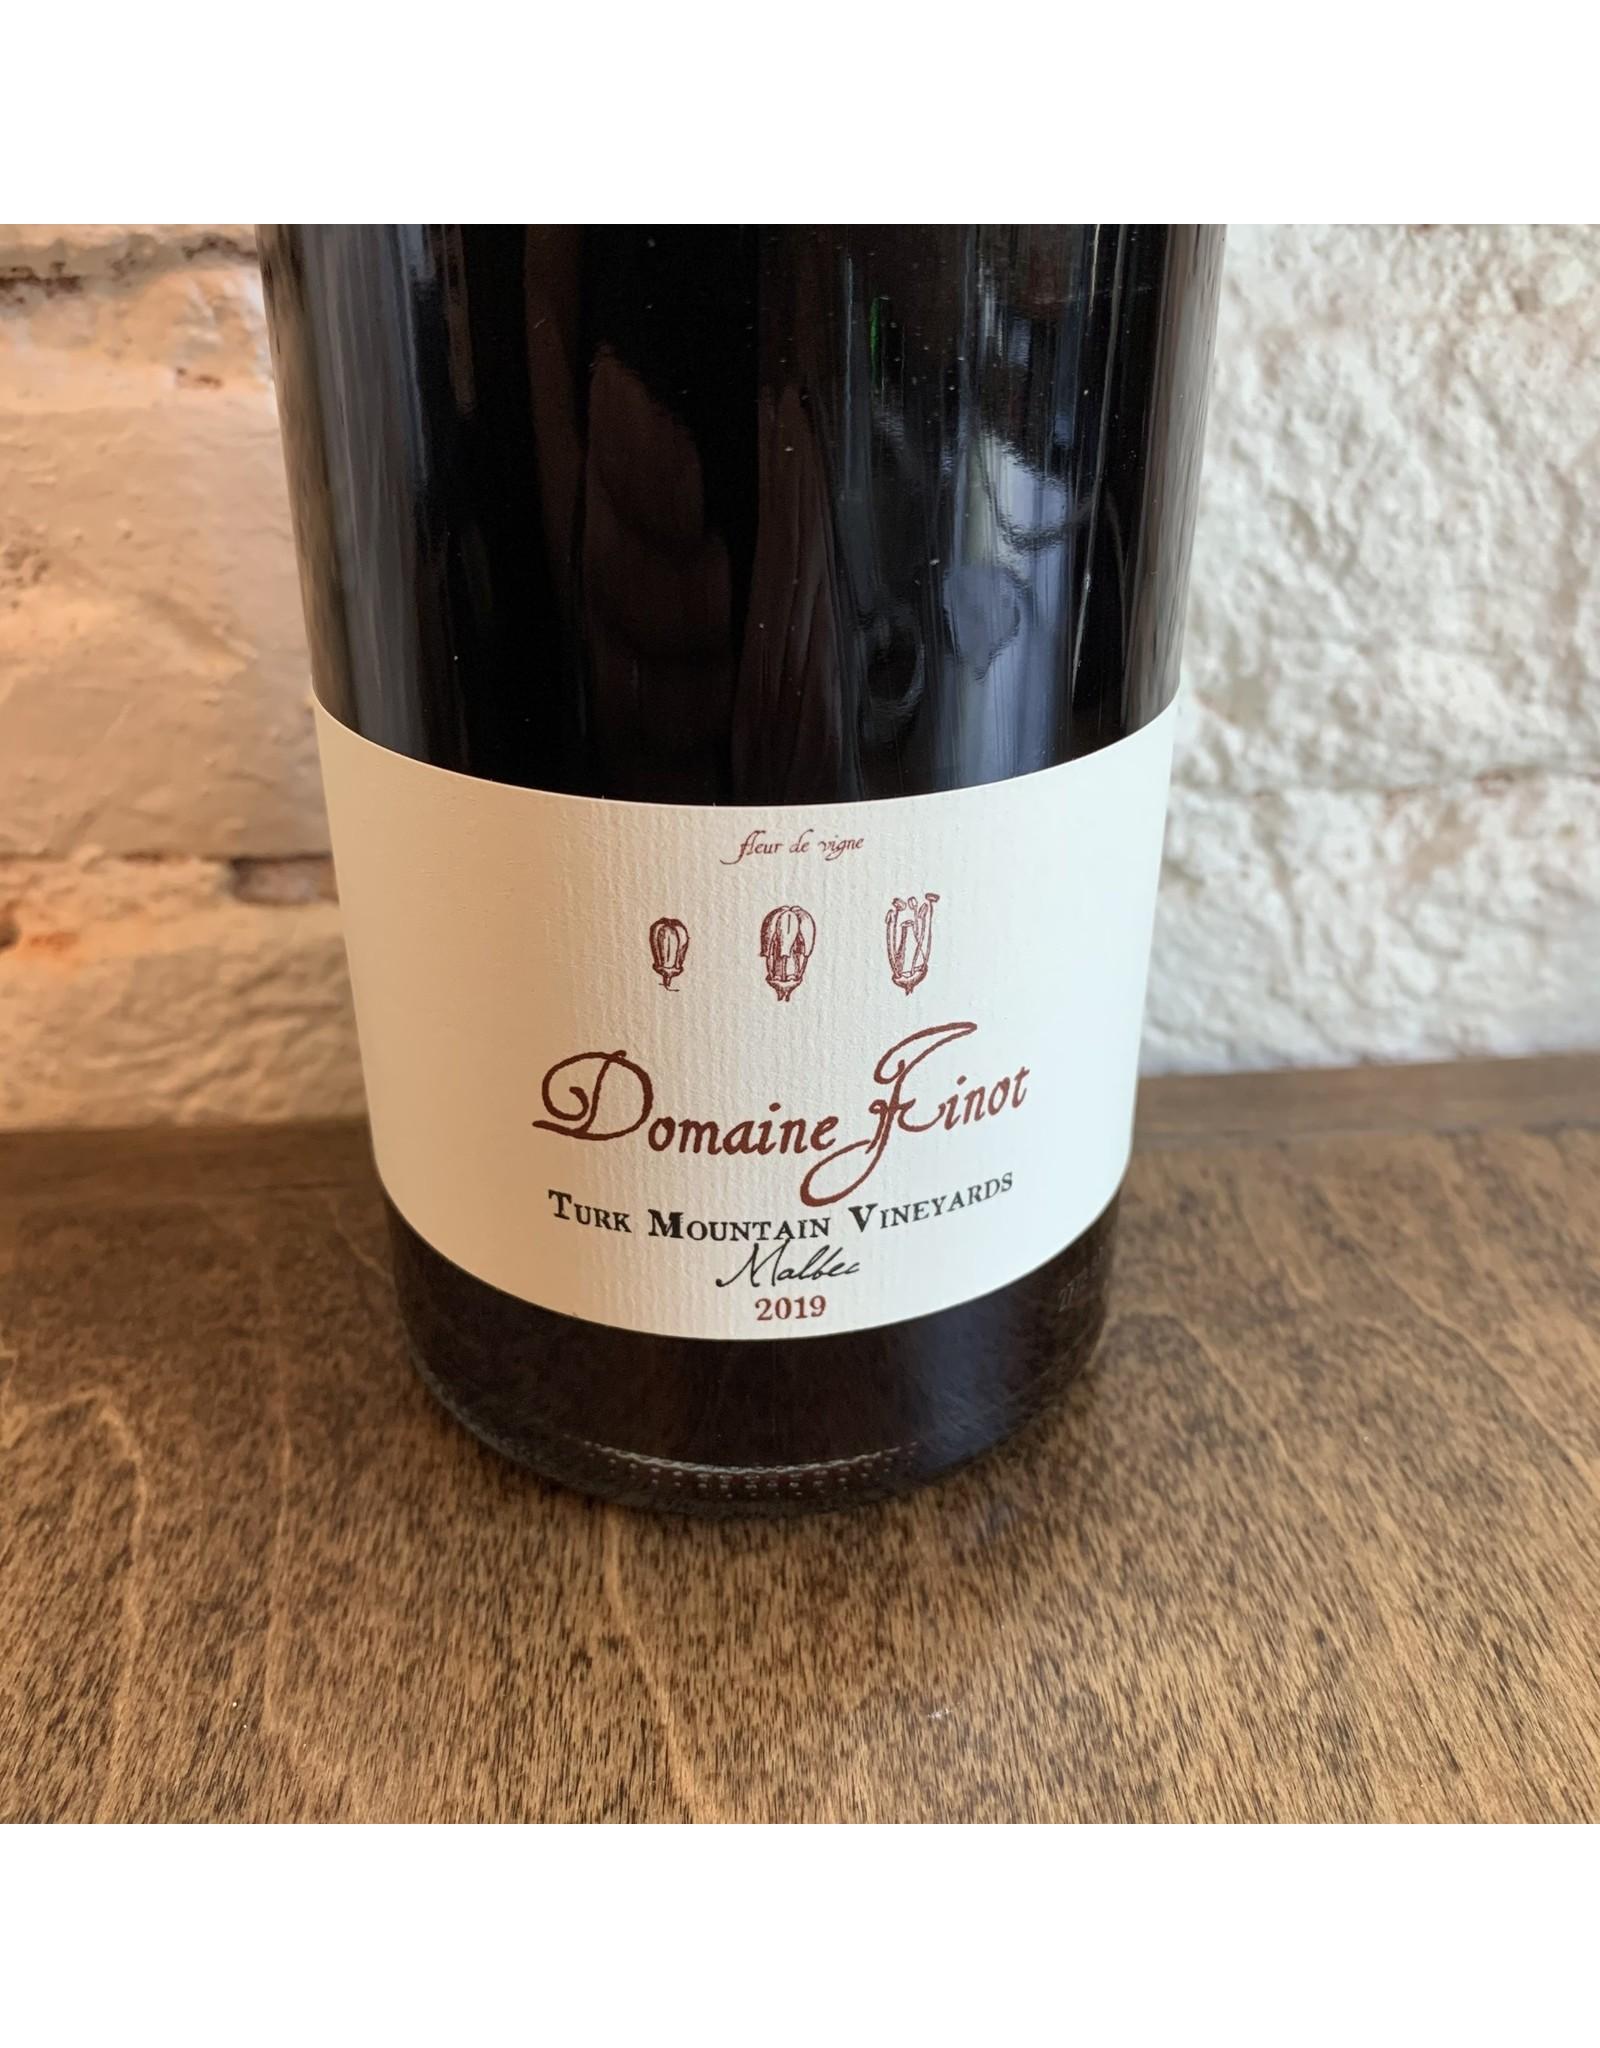 Domaine Finot Domaine Finot Malbec, Turk Mountain Vineyard 2019